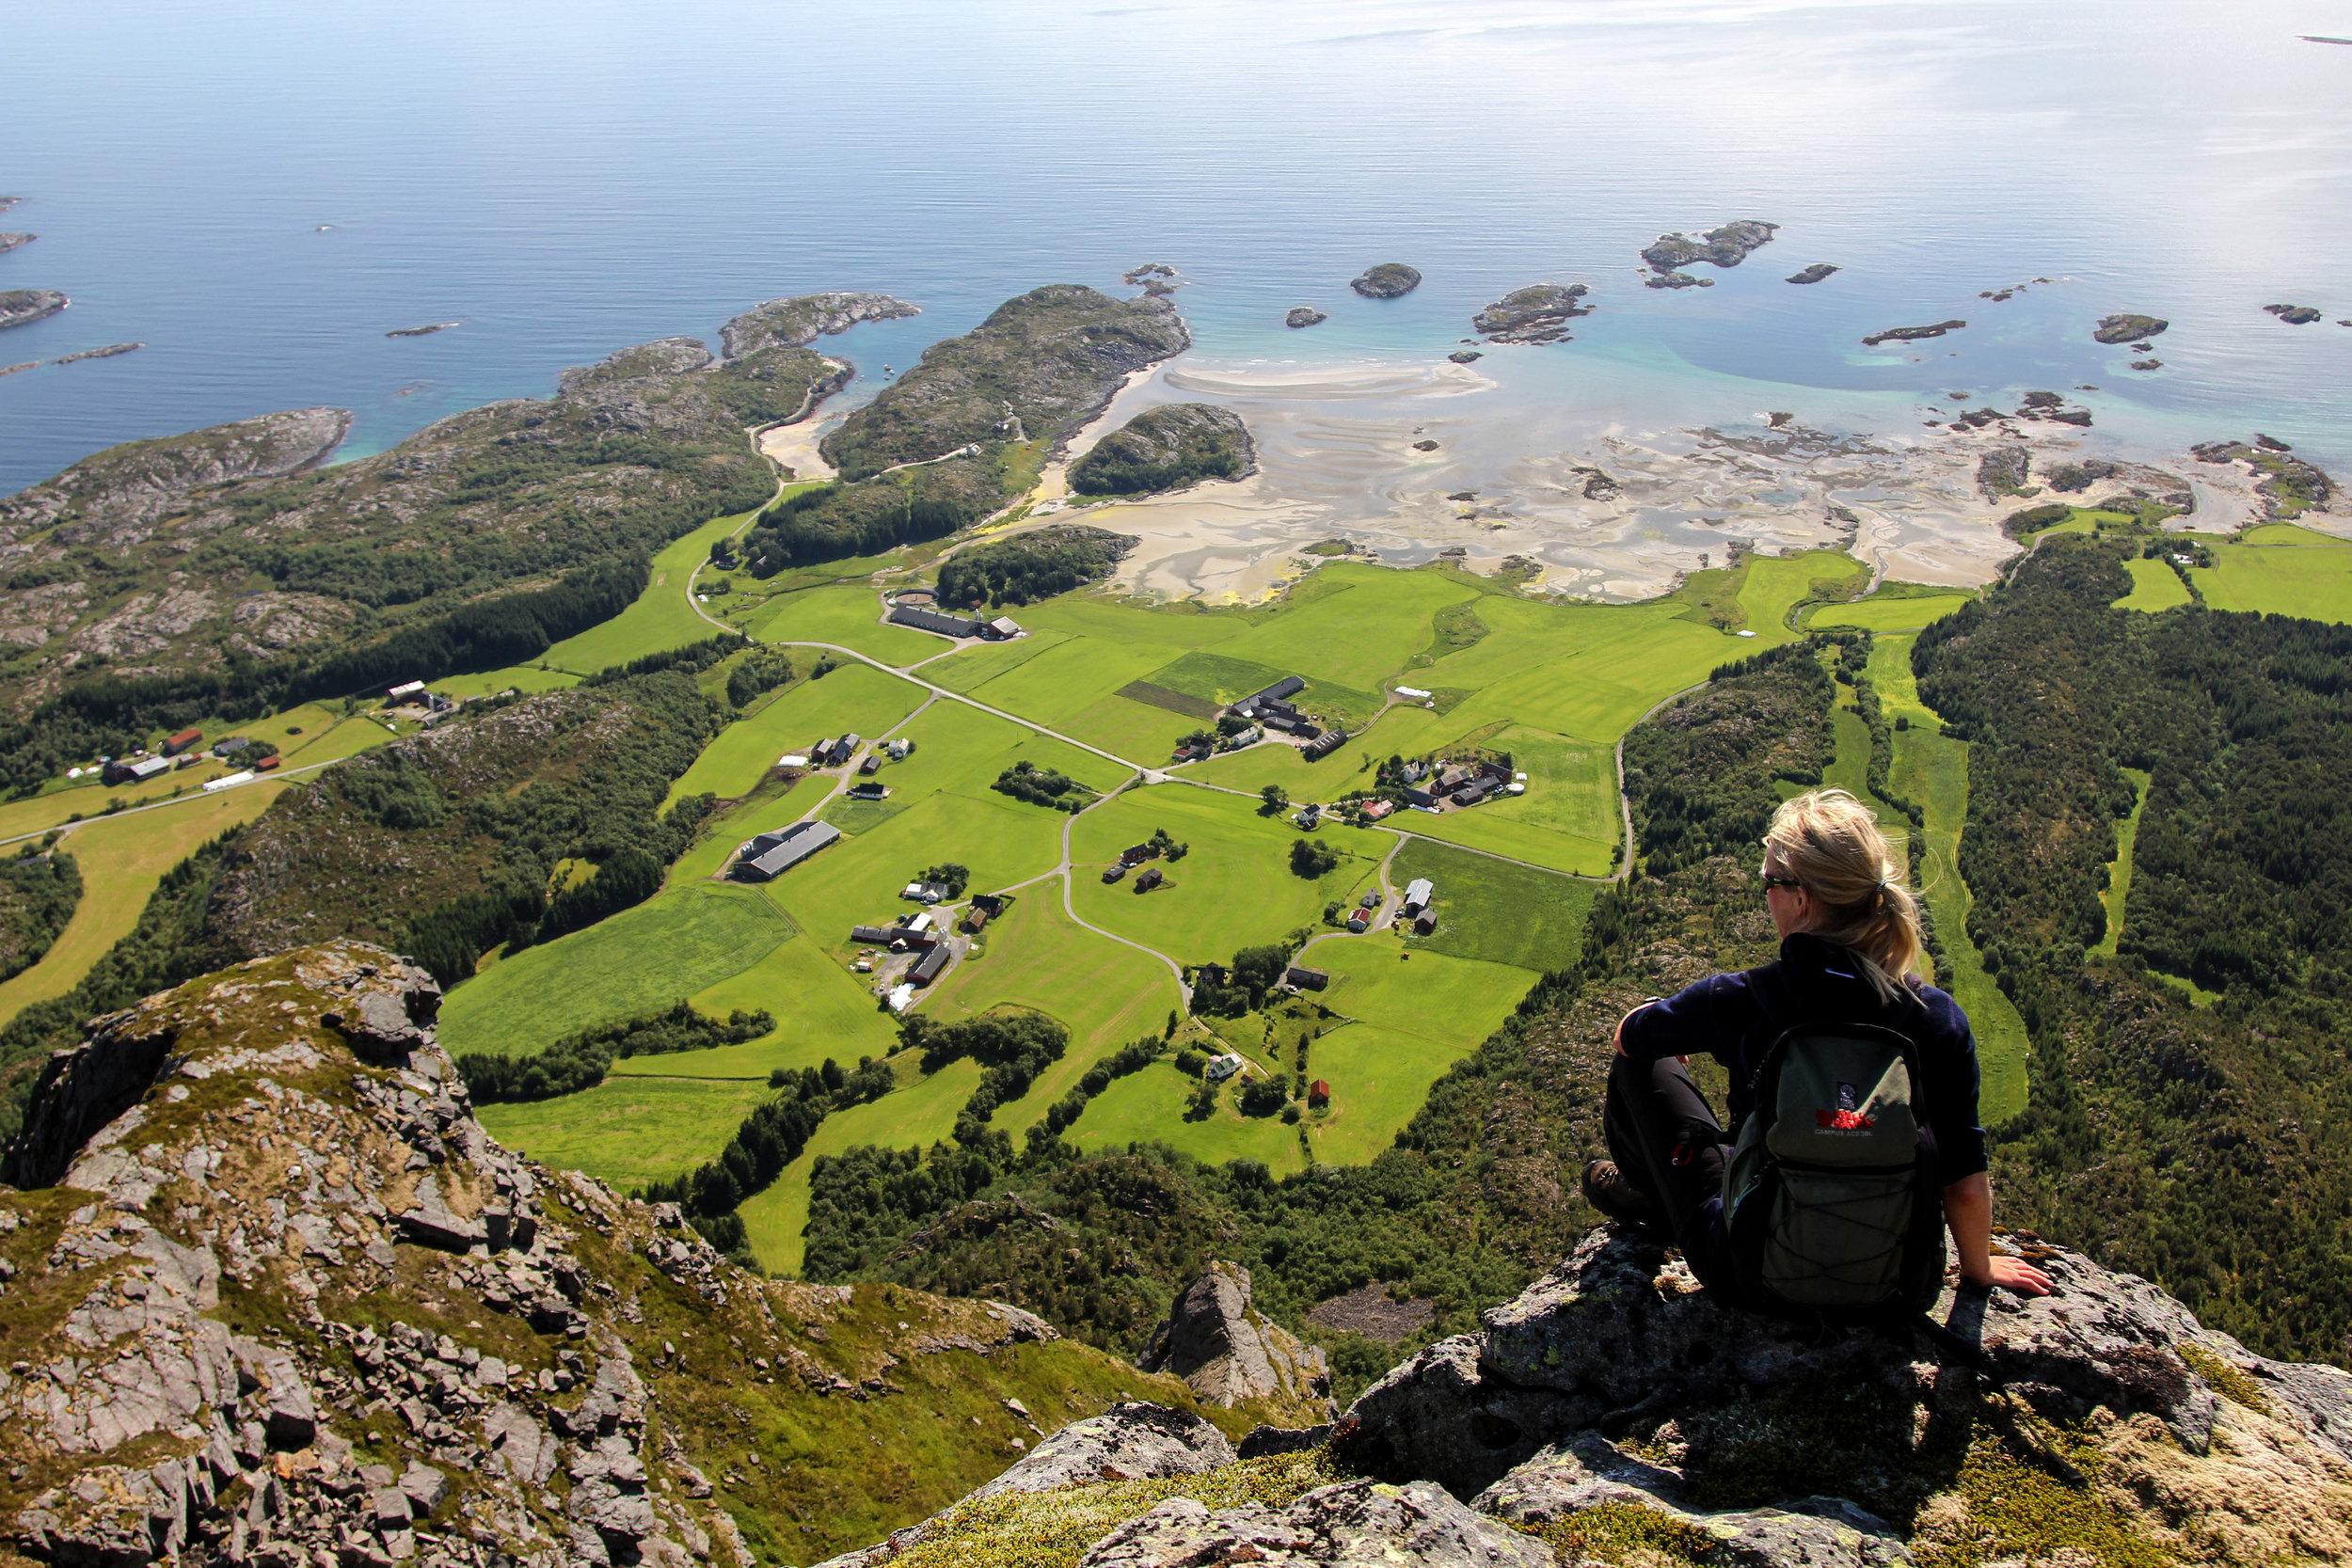 Foto: Øyvind Flatmo